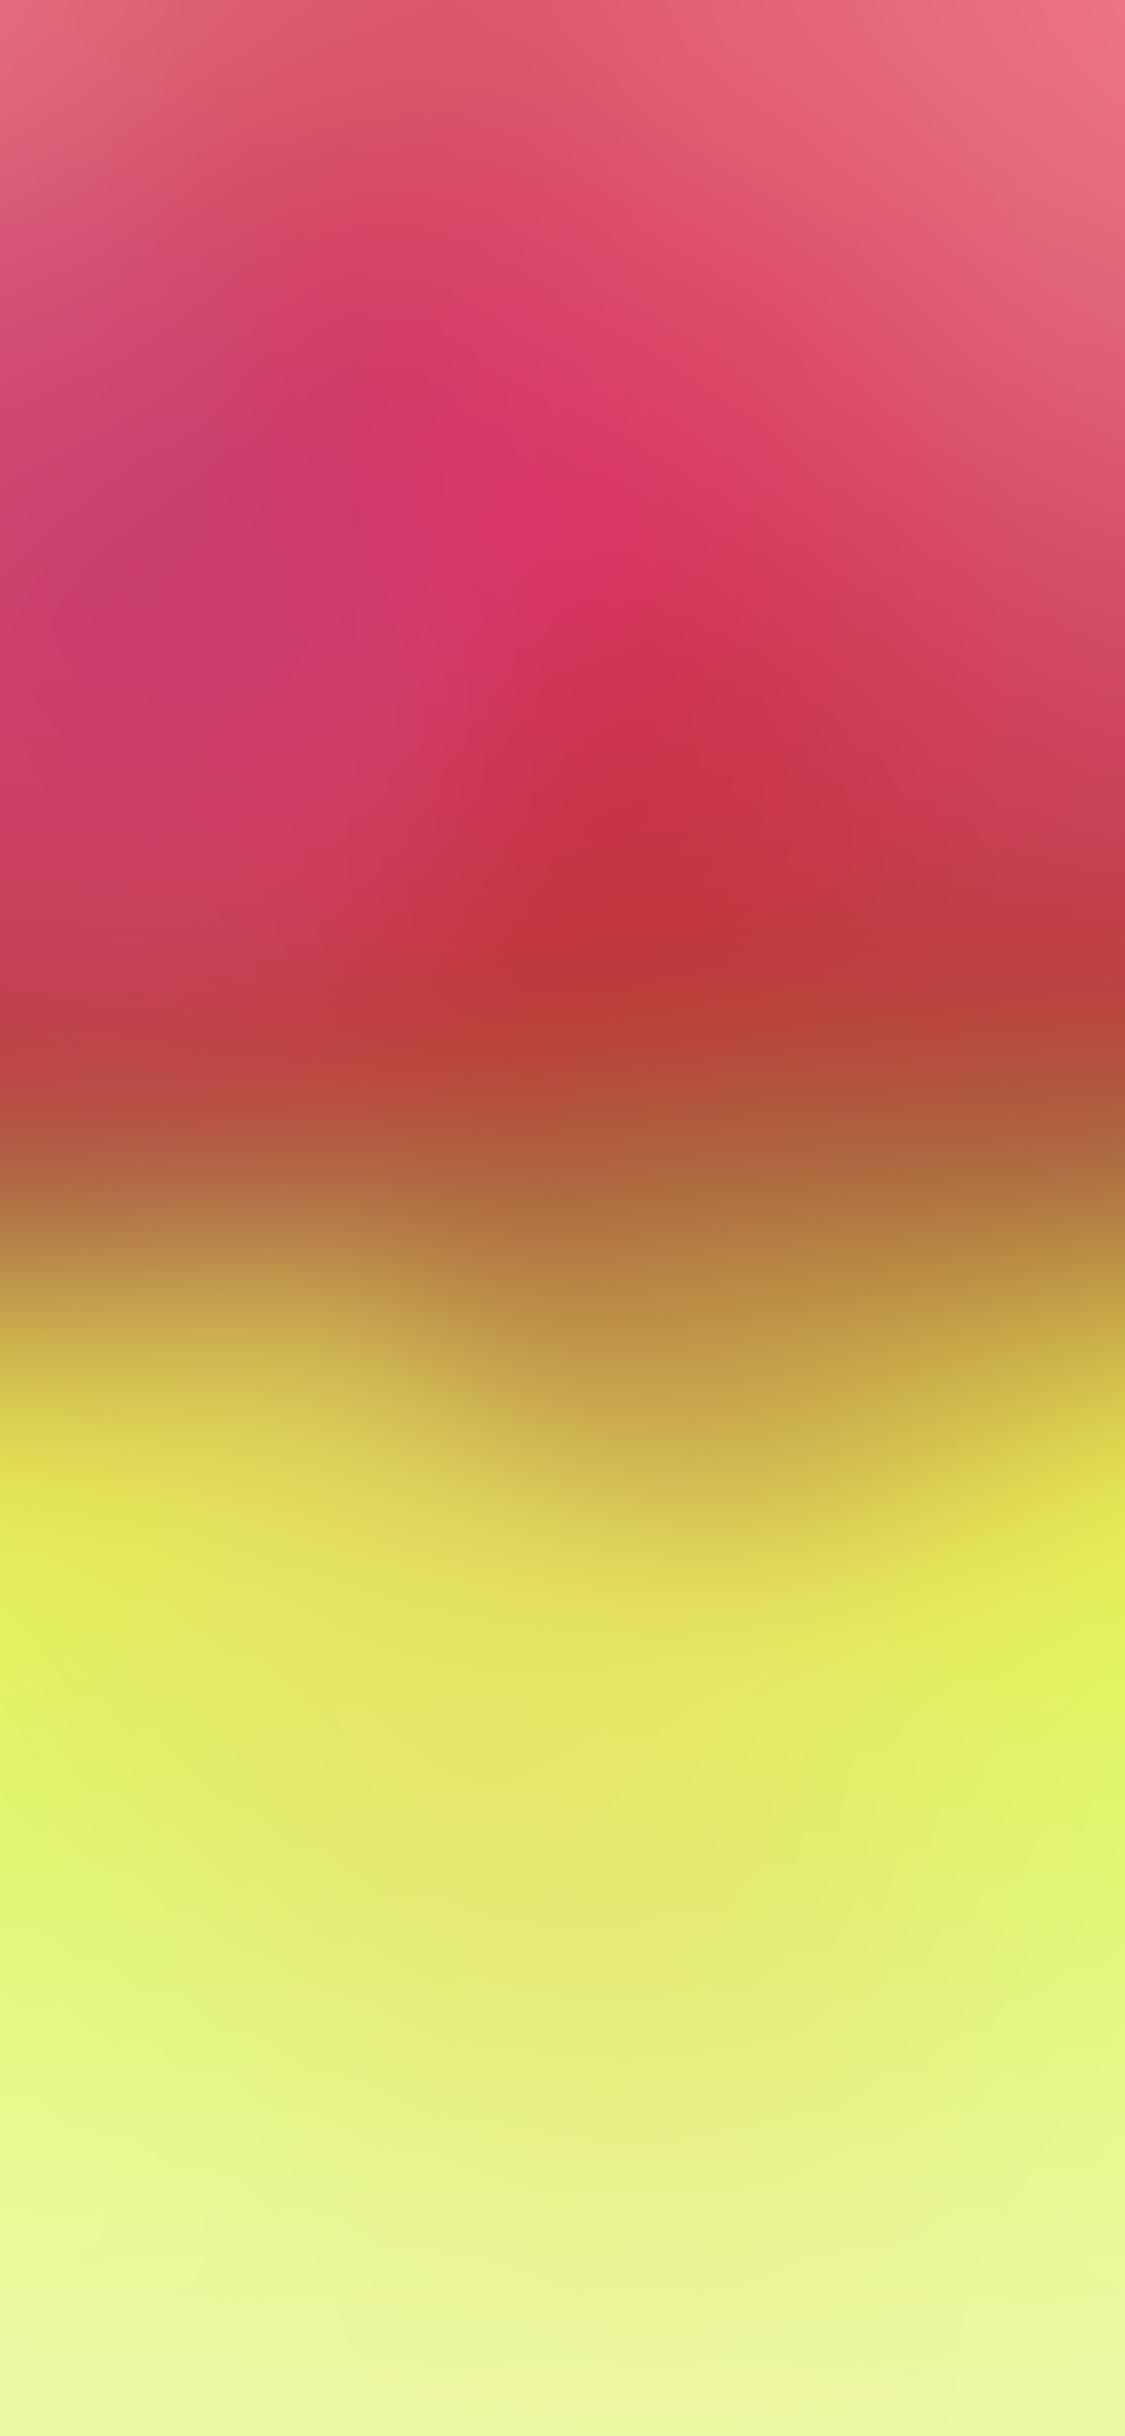 iPhoneXpapers.com-Apple-iPhone-wallpaper-sf70-cool-lemonade-pink-red-yellow-gradation-blur